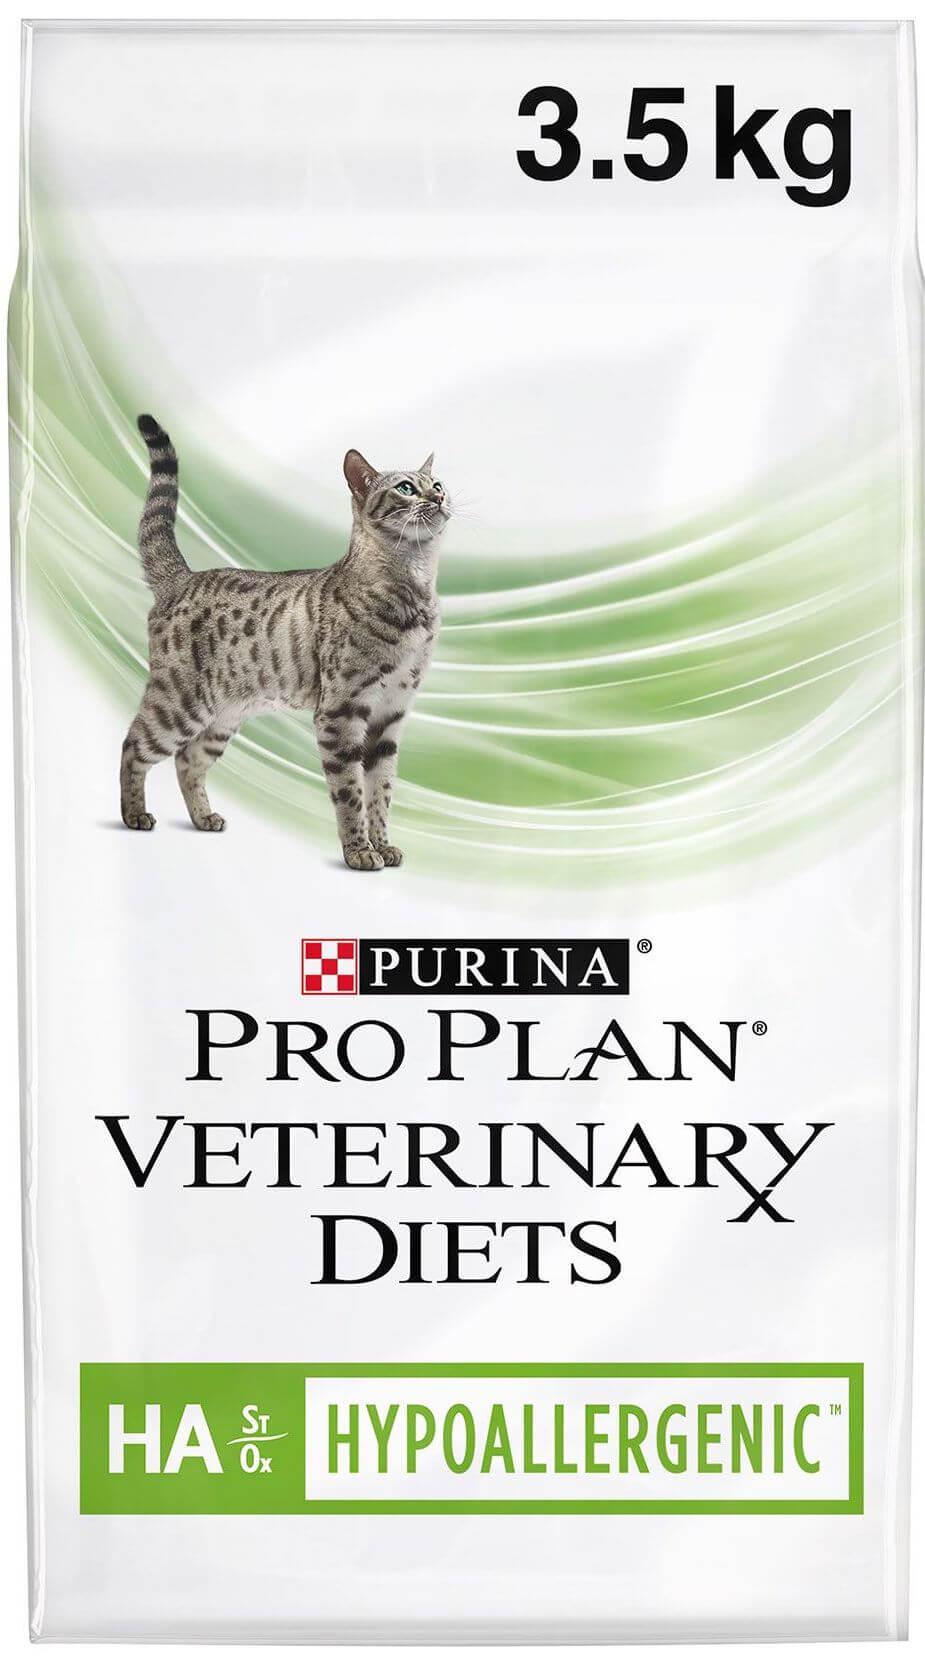 PRO PLAN VETERINARY DIETS Feline HA Hypoallergenic Dry Cat Food 3.5kg - Home-Made Allergy-Friendly Pet Food